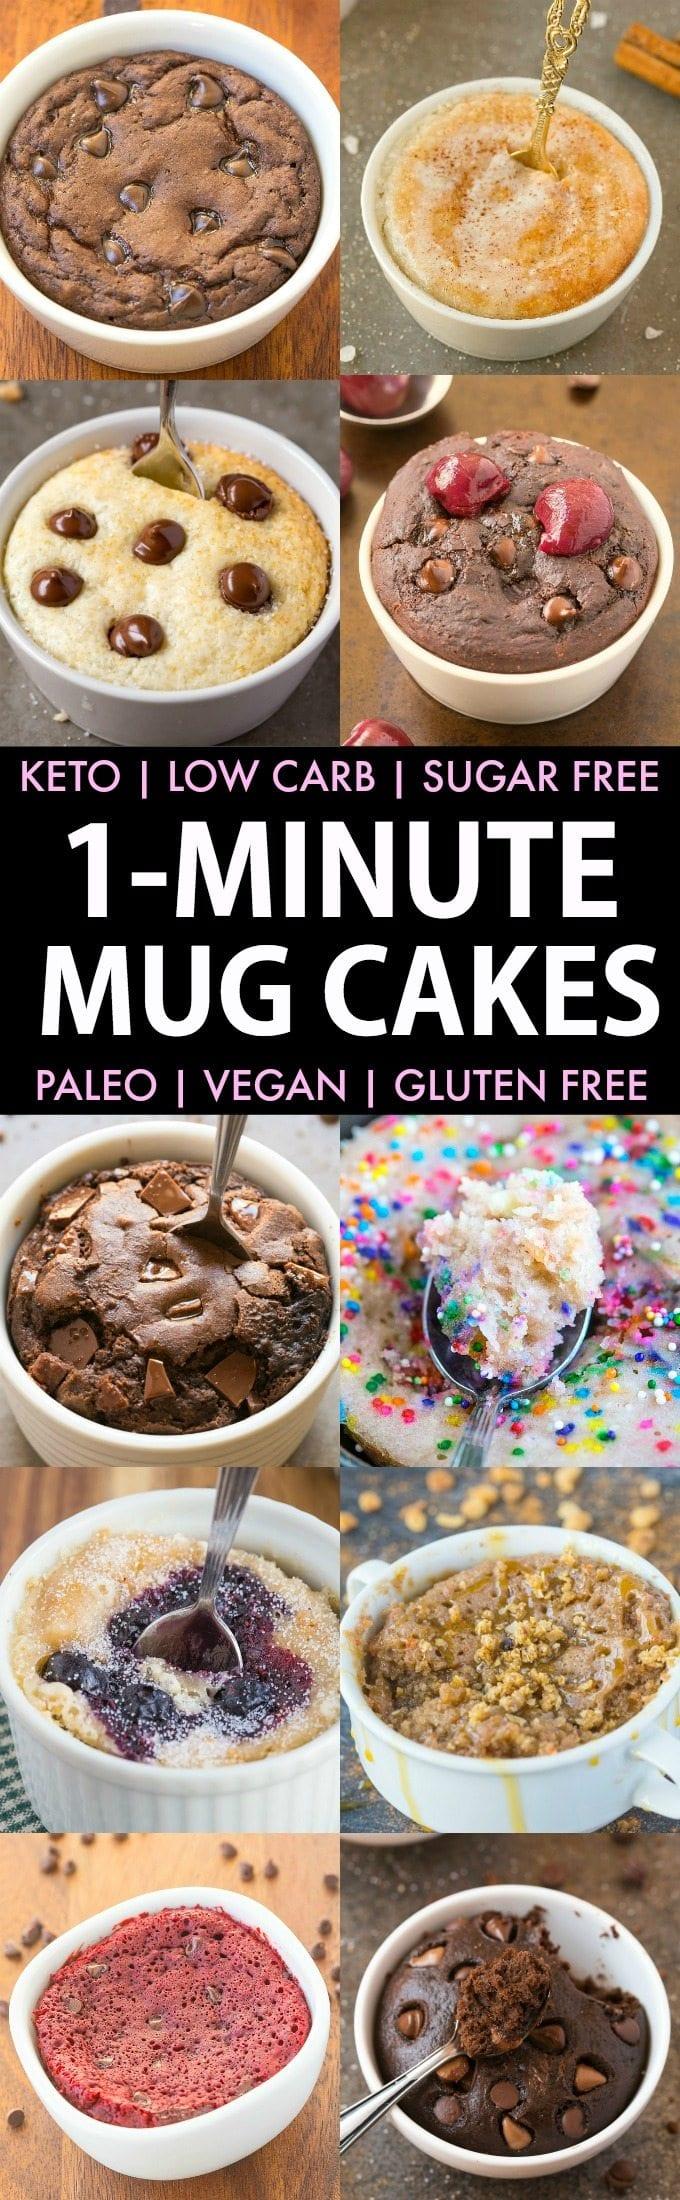 1-Minute Keto Mug Cakes (Paleo, Vegan, Low Carb, Sugar Free)- Easy mug cake, mug muffin and mug brownie recipes which take less than a minute and perfect single serve healthy treat- NO butter, grains or eggs needed! #keto #ketodessert #mugcake | Recipe on thebigmansworld.com